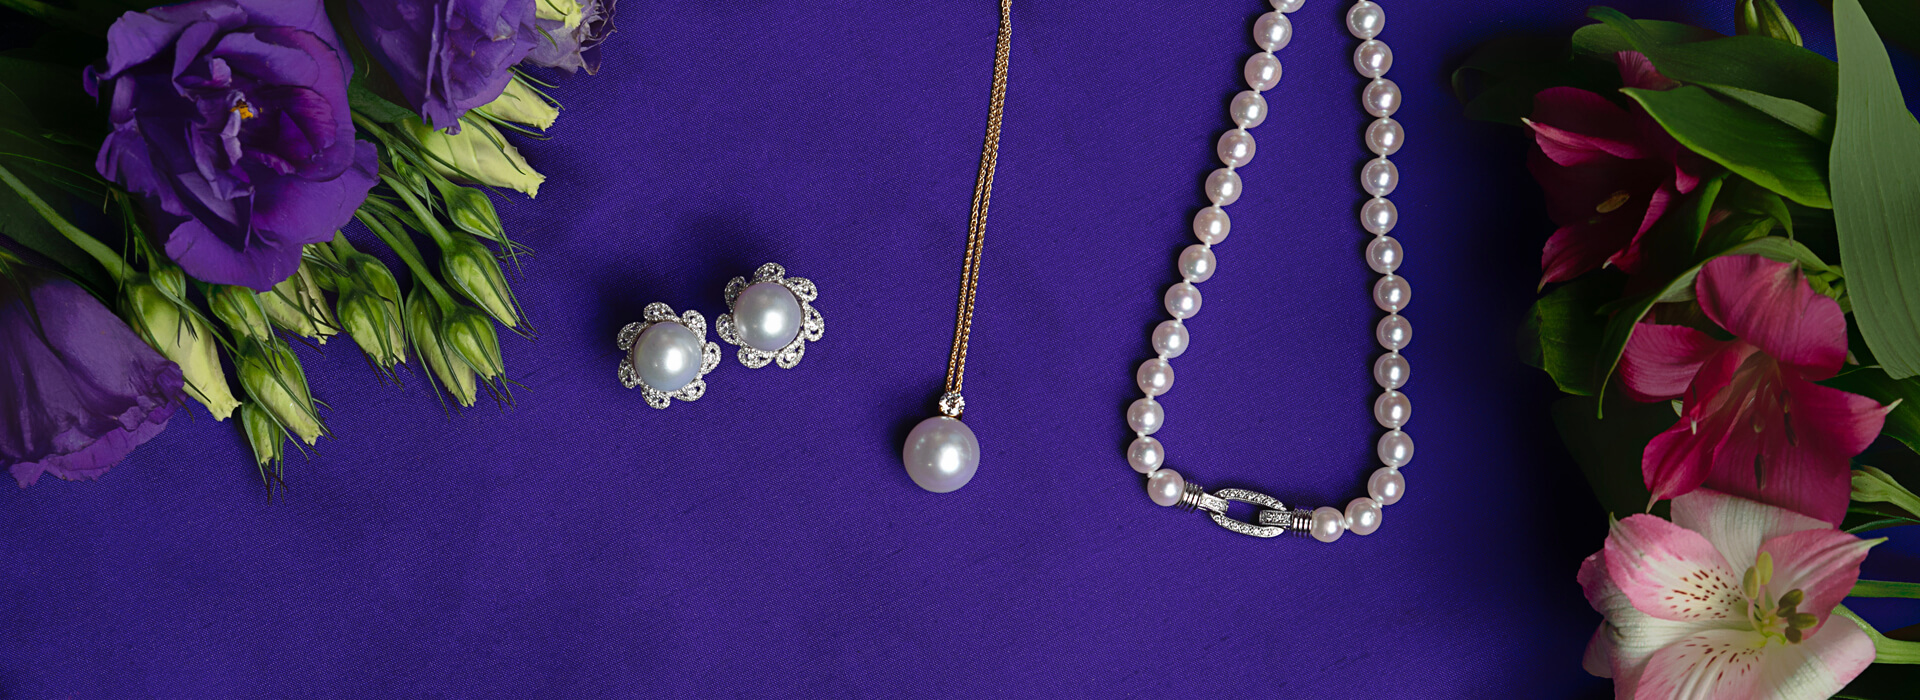 jewellery-pearl-